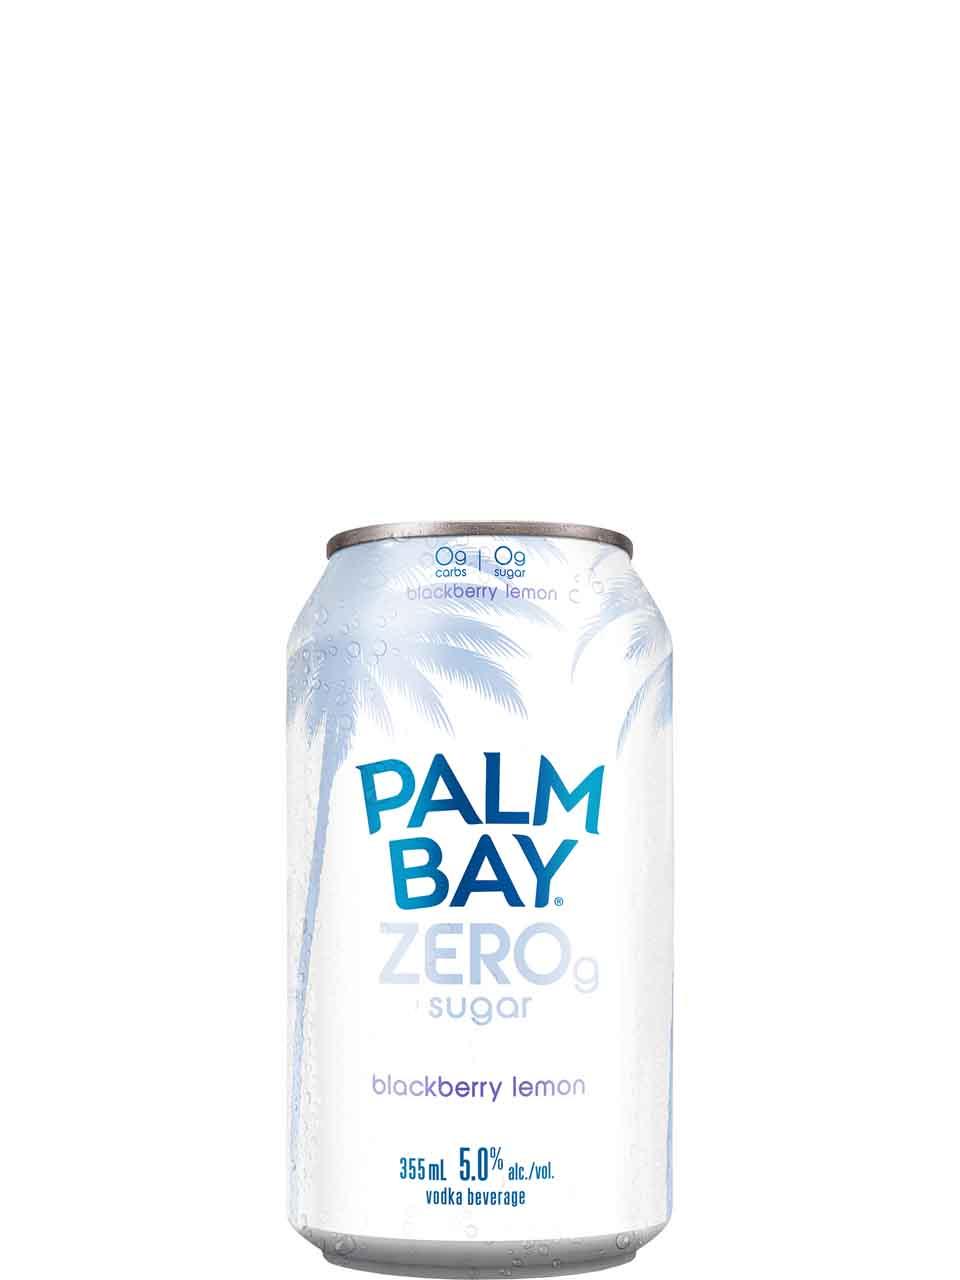 Palm Bay ZERO Blackberry Lemon 6 Pack Cans